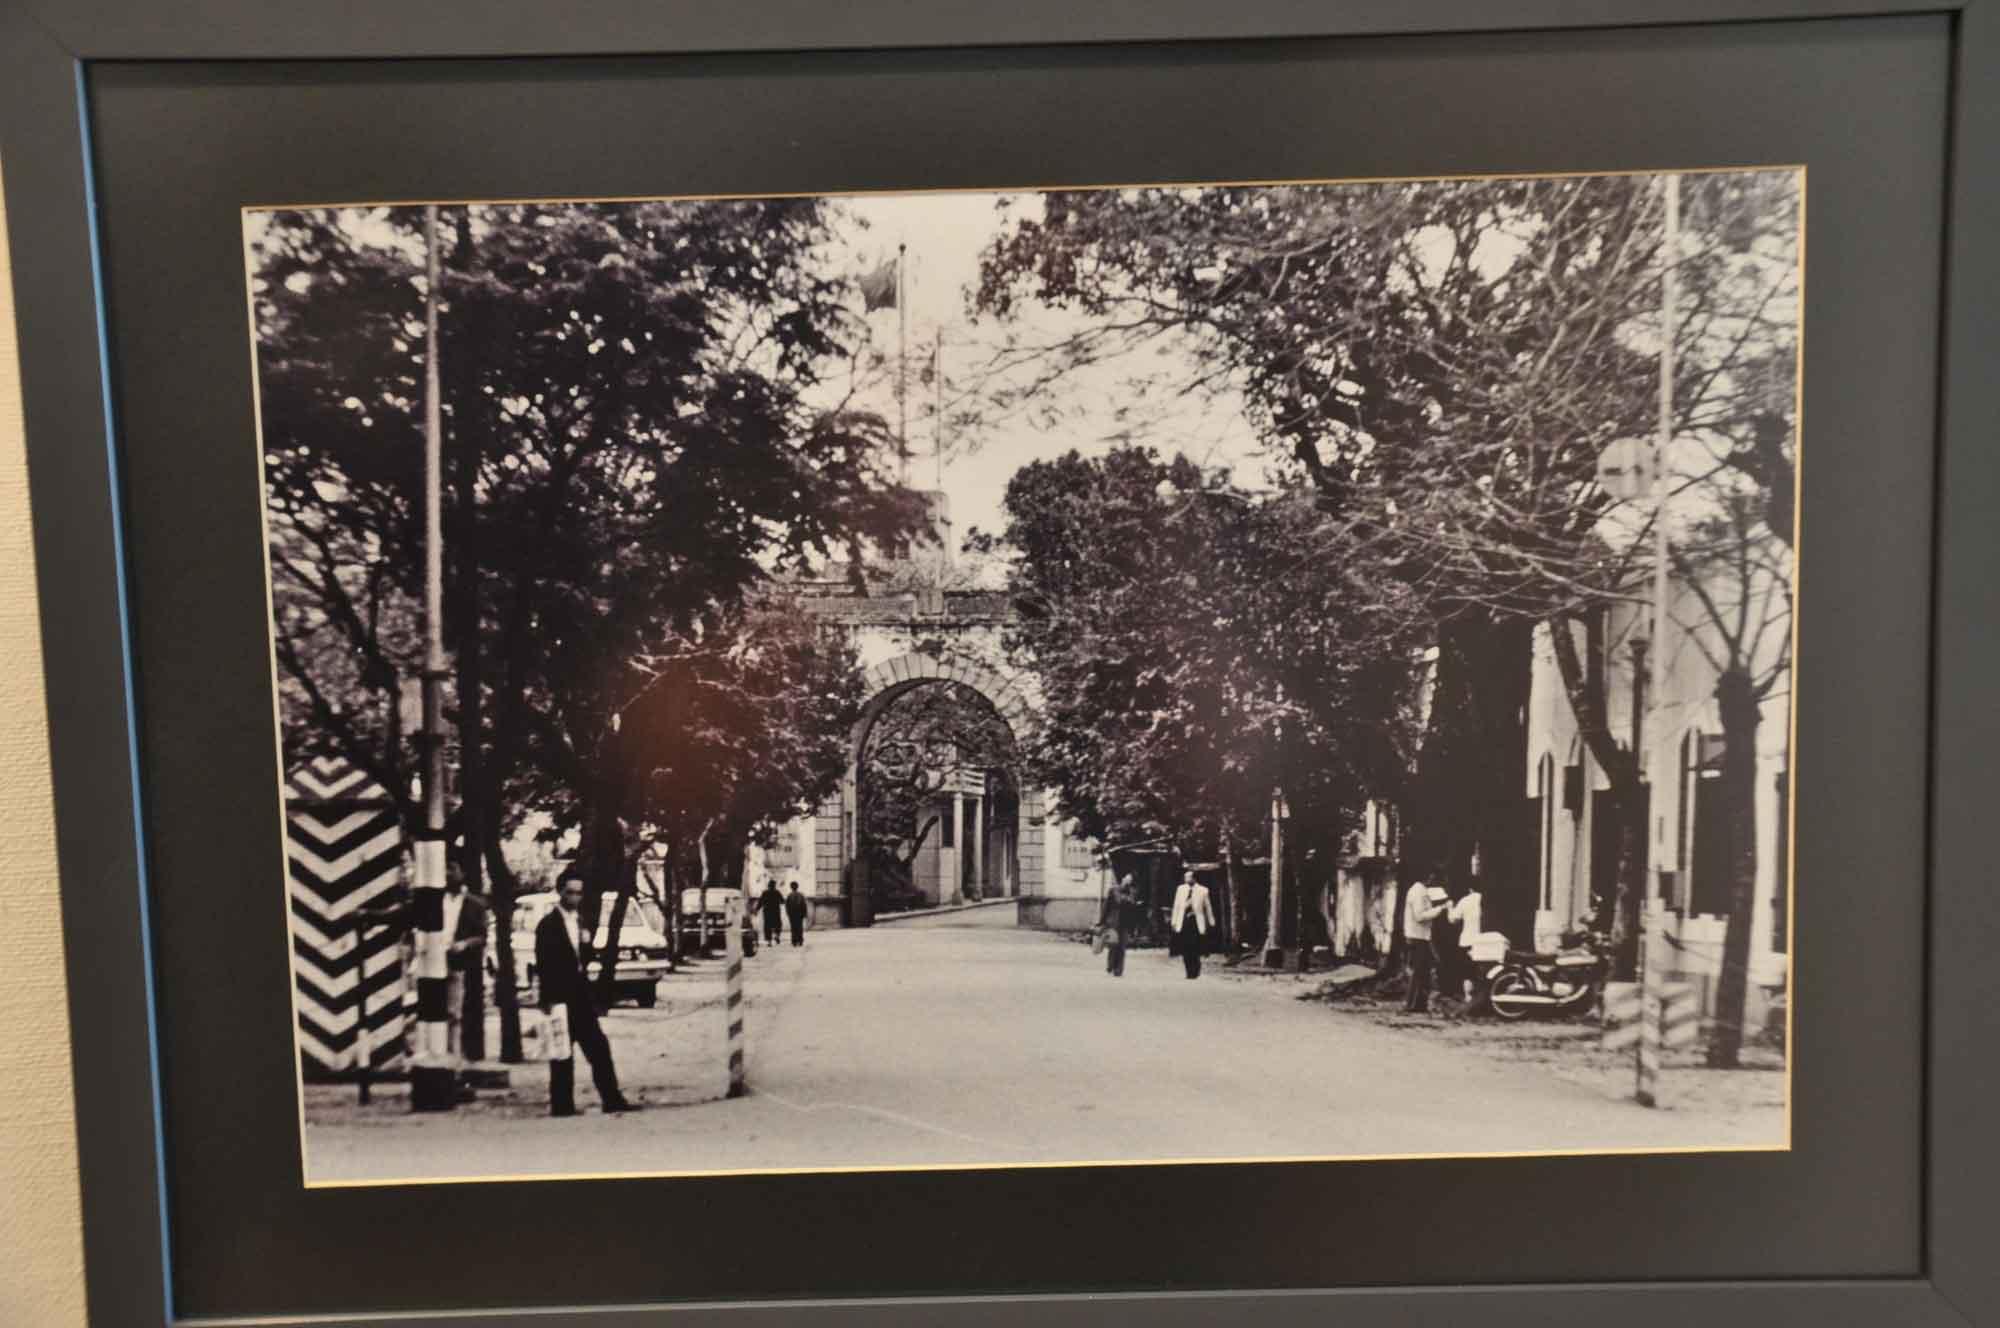 Old Barrier Gate Macau